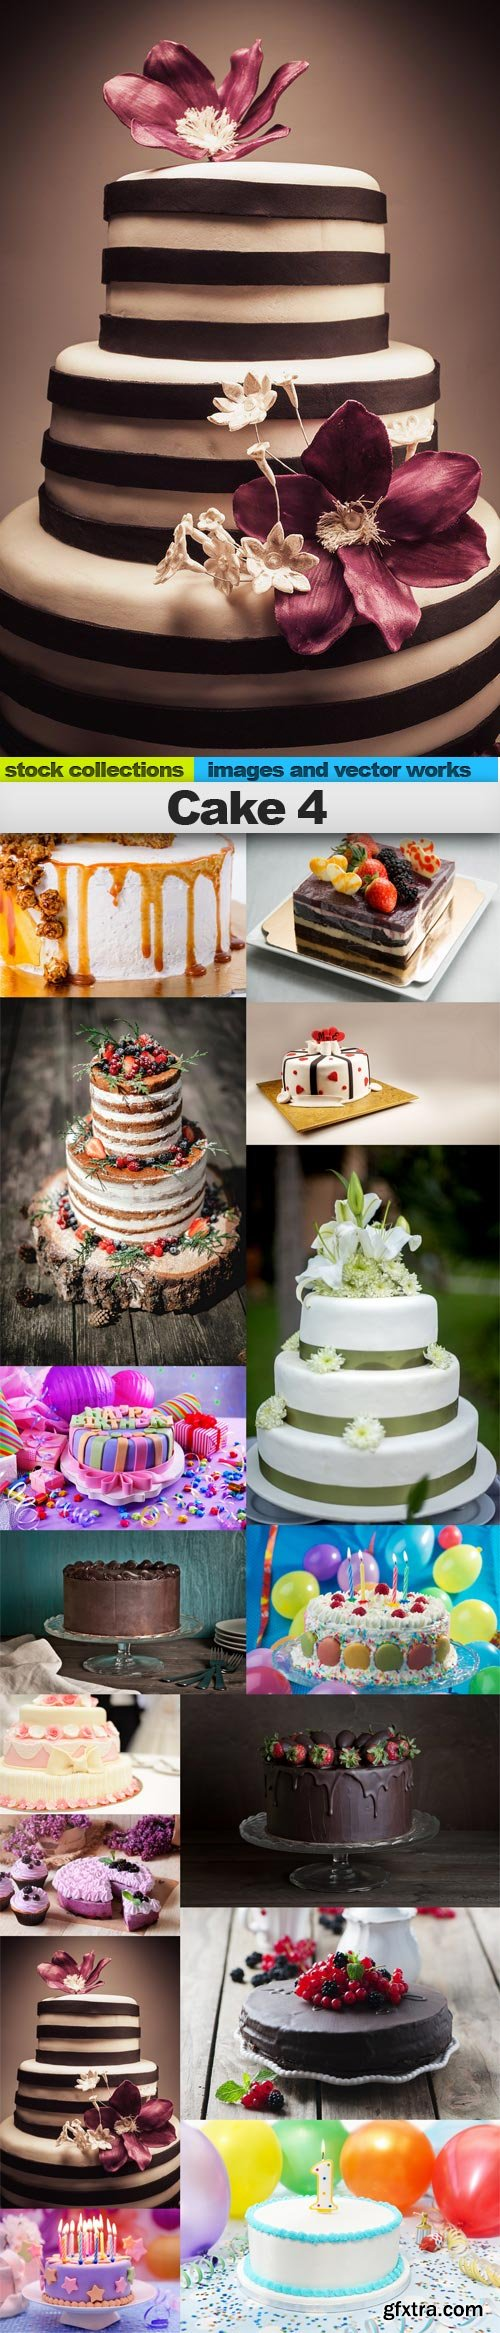 Cake 4, 15 x UHQ JPEG